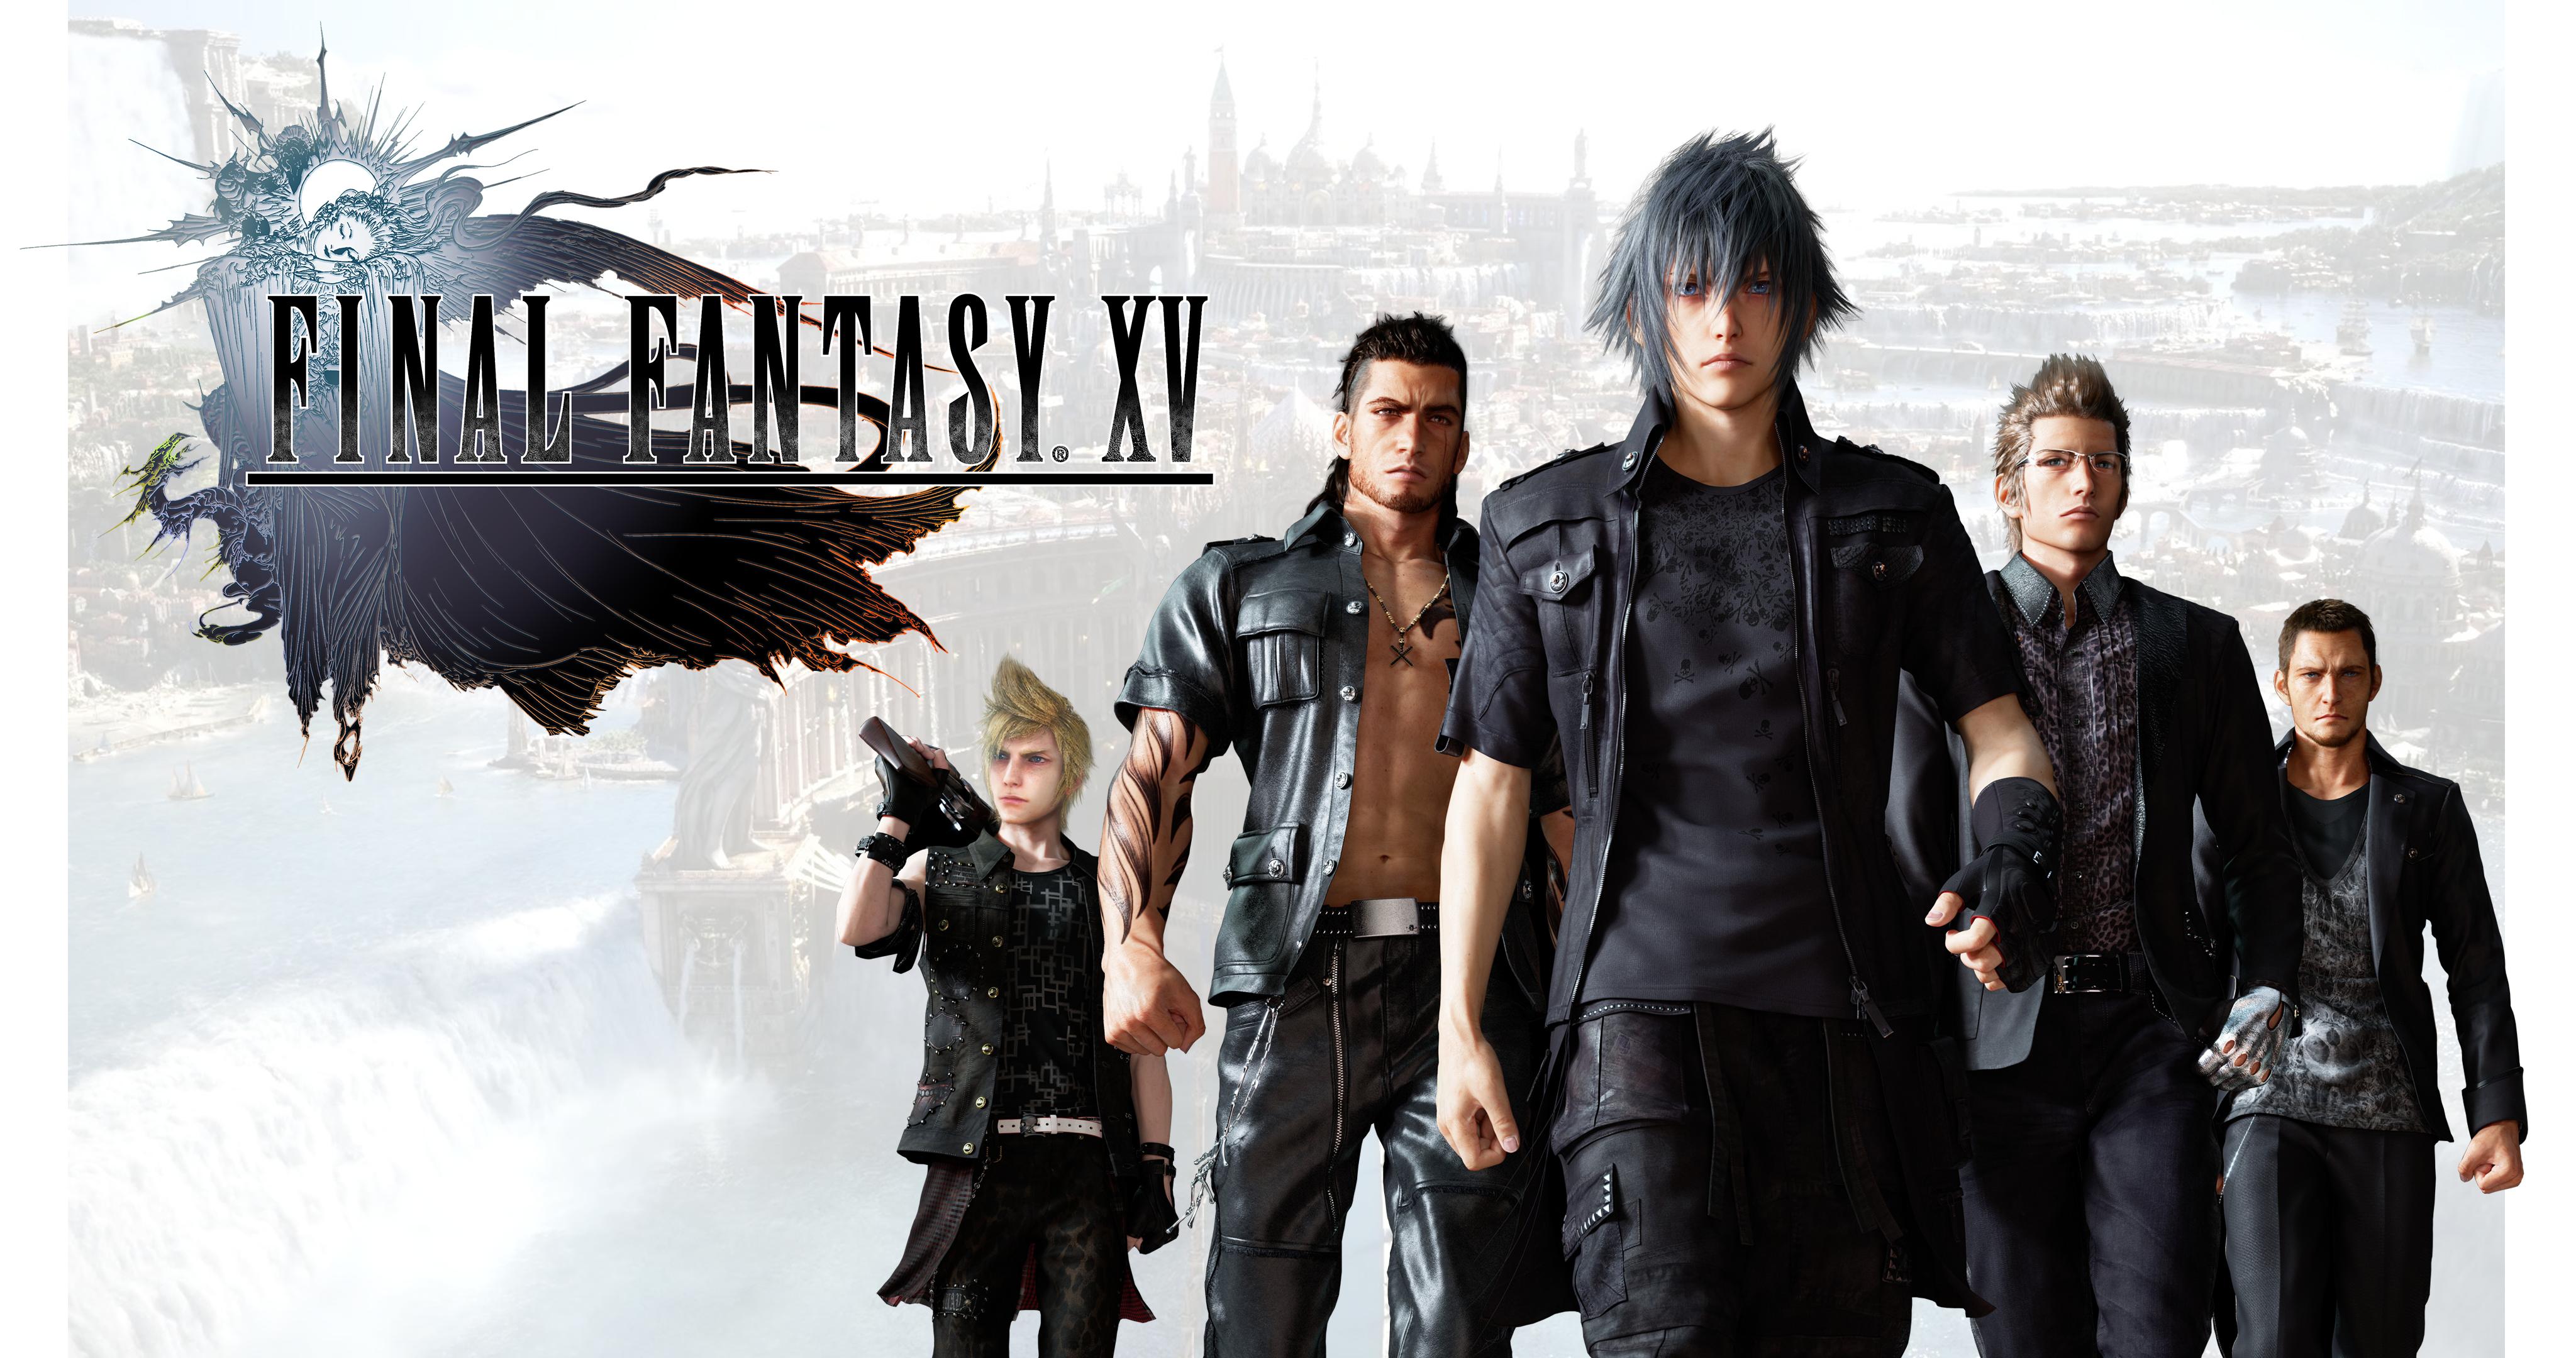 final_fantasy_xv_wallpaper_4k__whit_new_prompto_by_realzeles-d9fy9ow Daha fazla bilgi | Anime ve Manga haberleri | Oyun ve Teknoloji